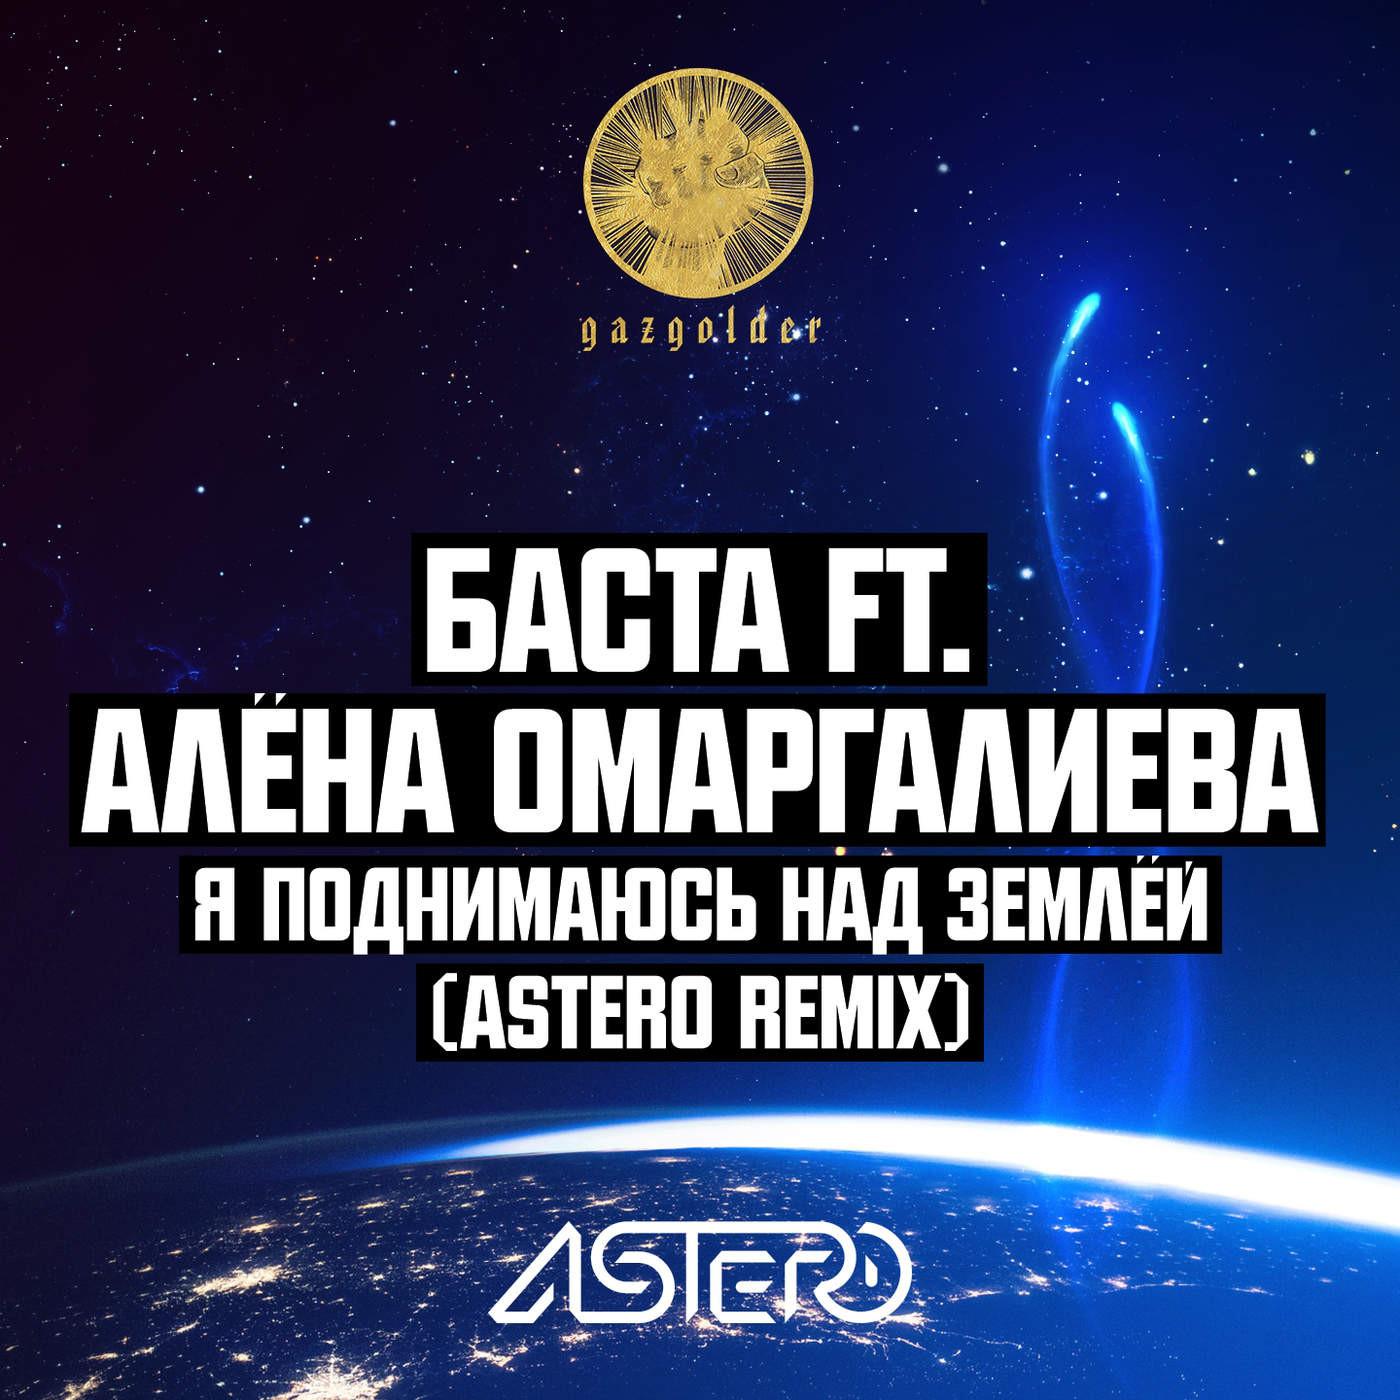 Баста feat. Алёна Омаргалиева - Я Поднимаюсь Над Землей (Astero Remix) (2016)